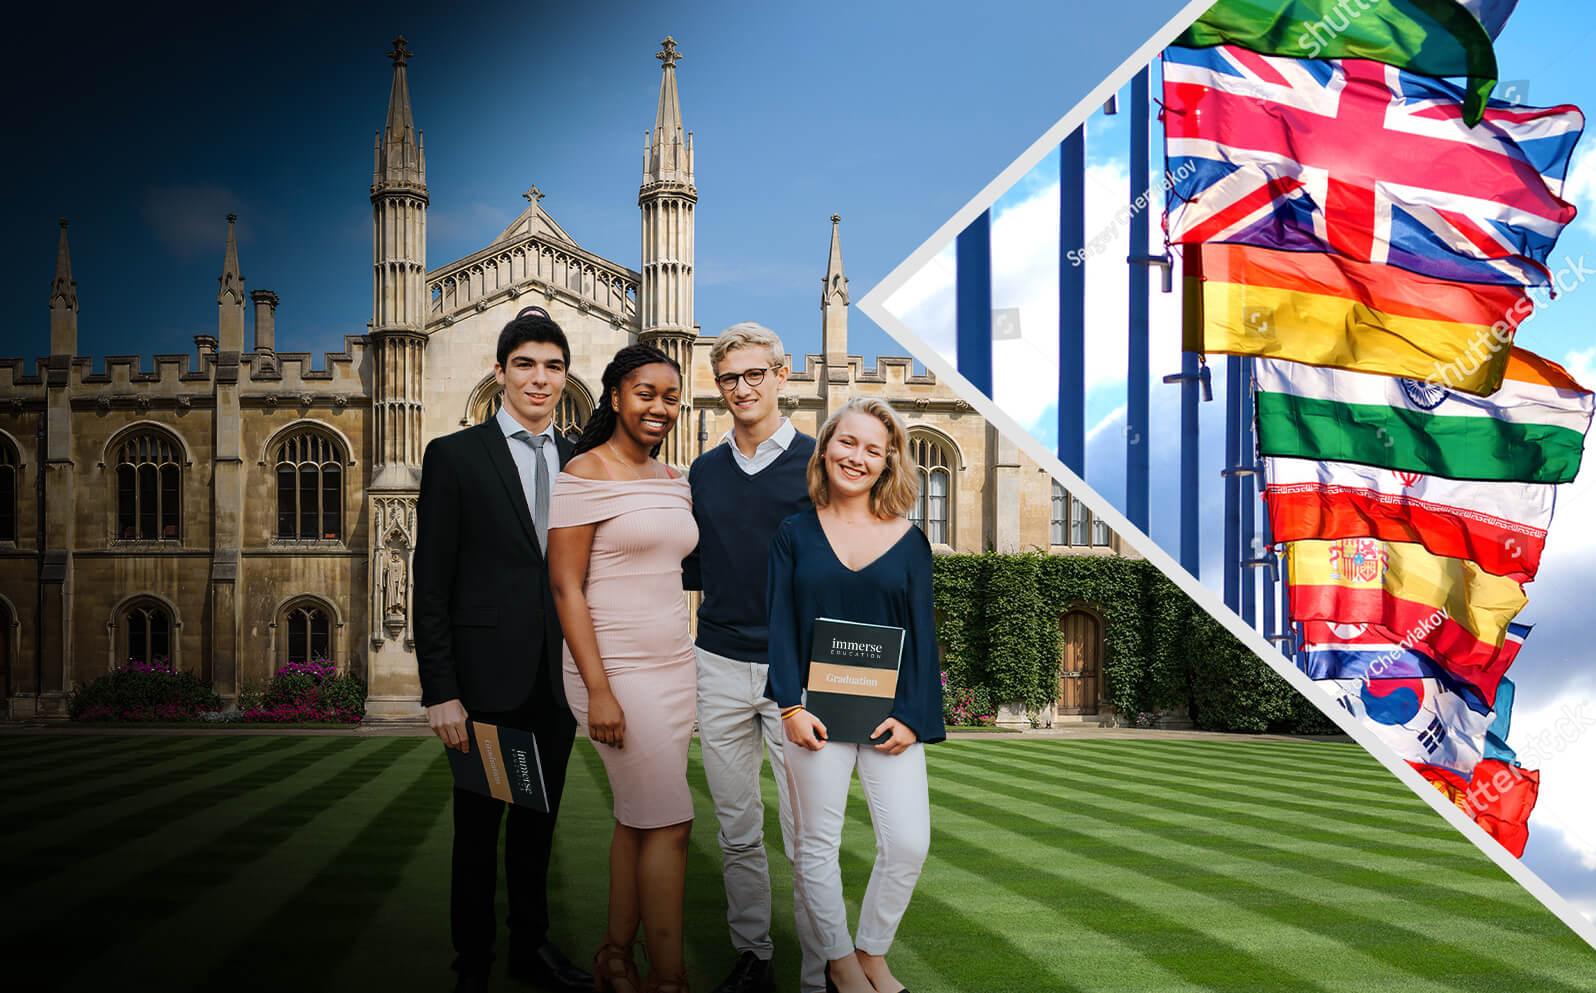 Cambridge International Relations Summer Program for Ages 16-18